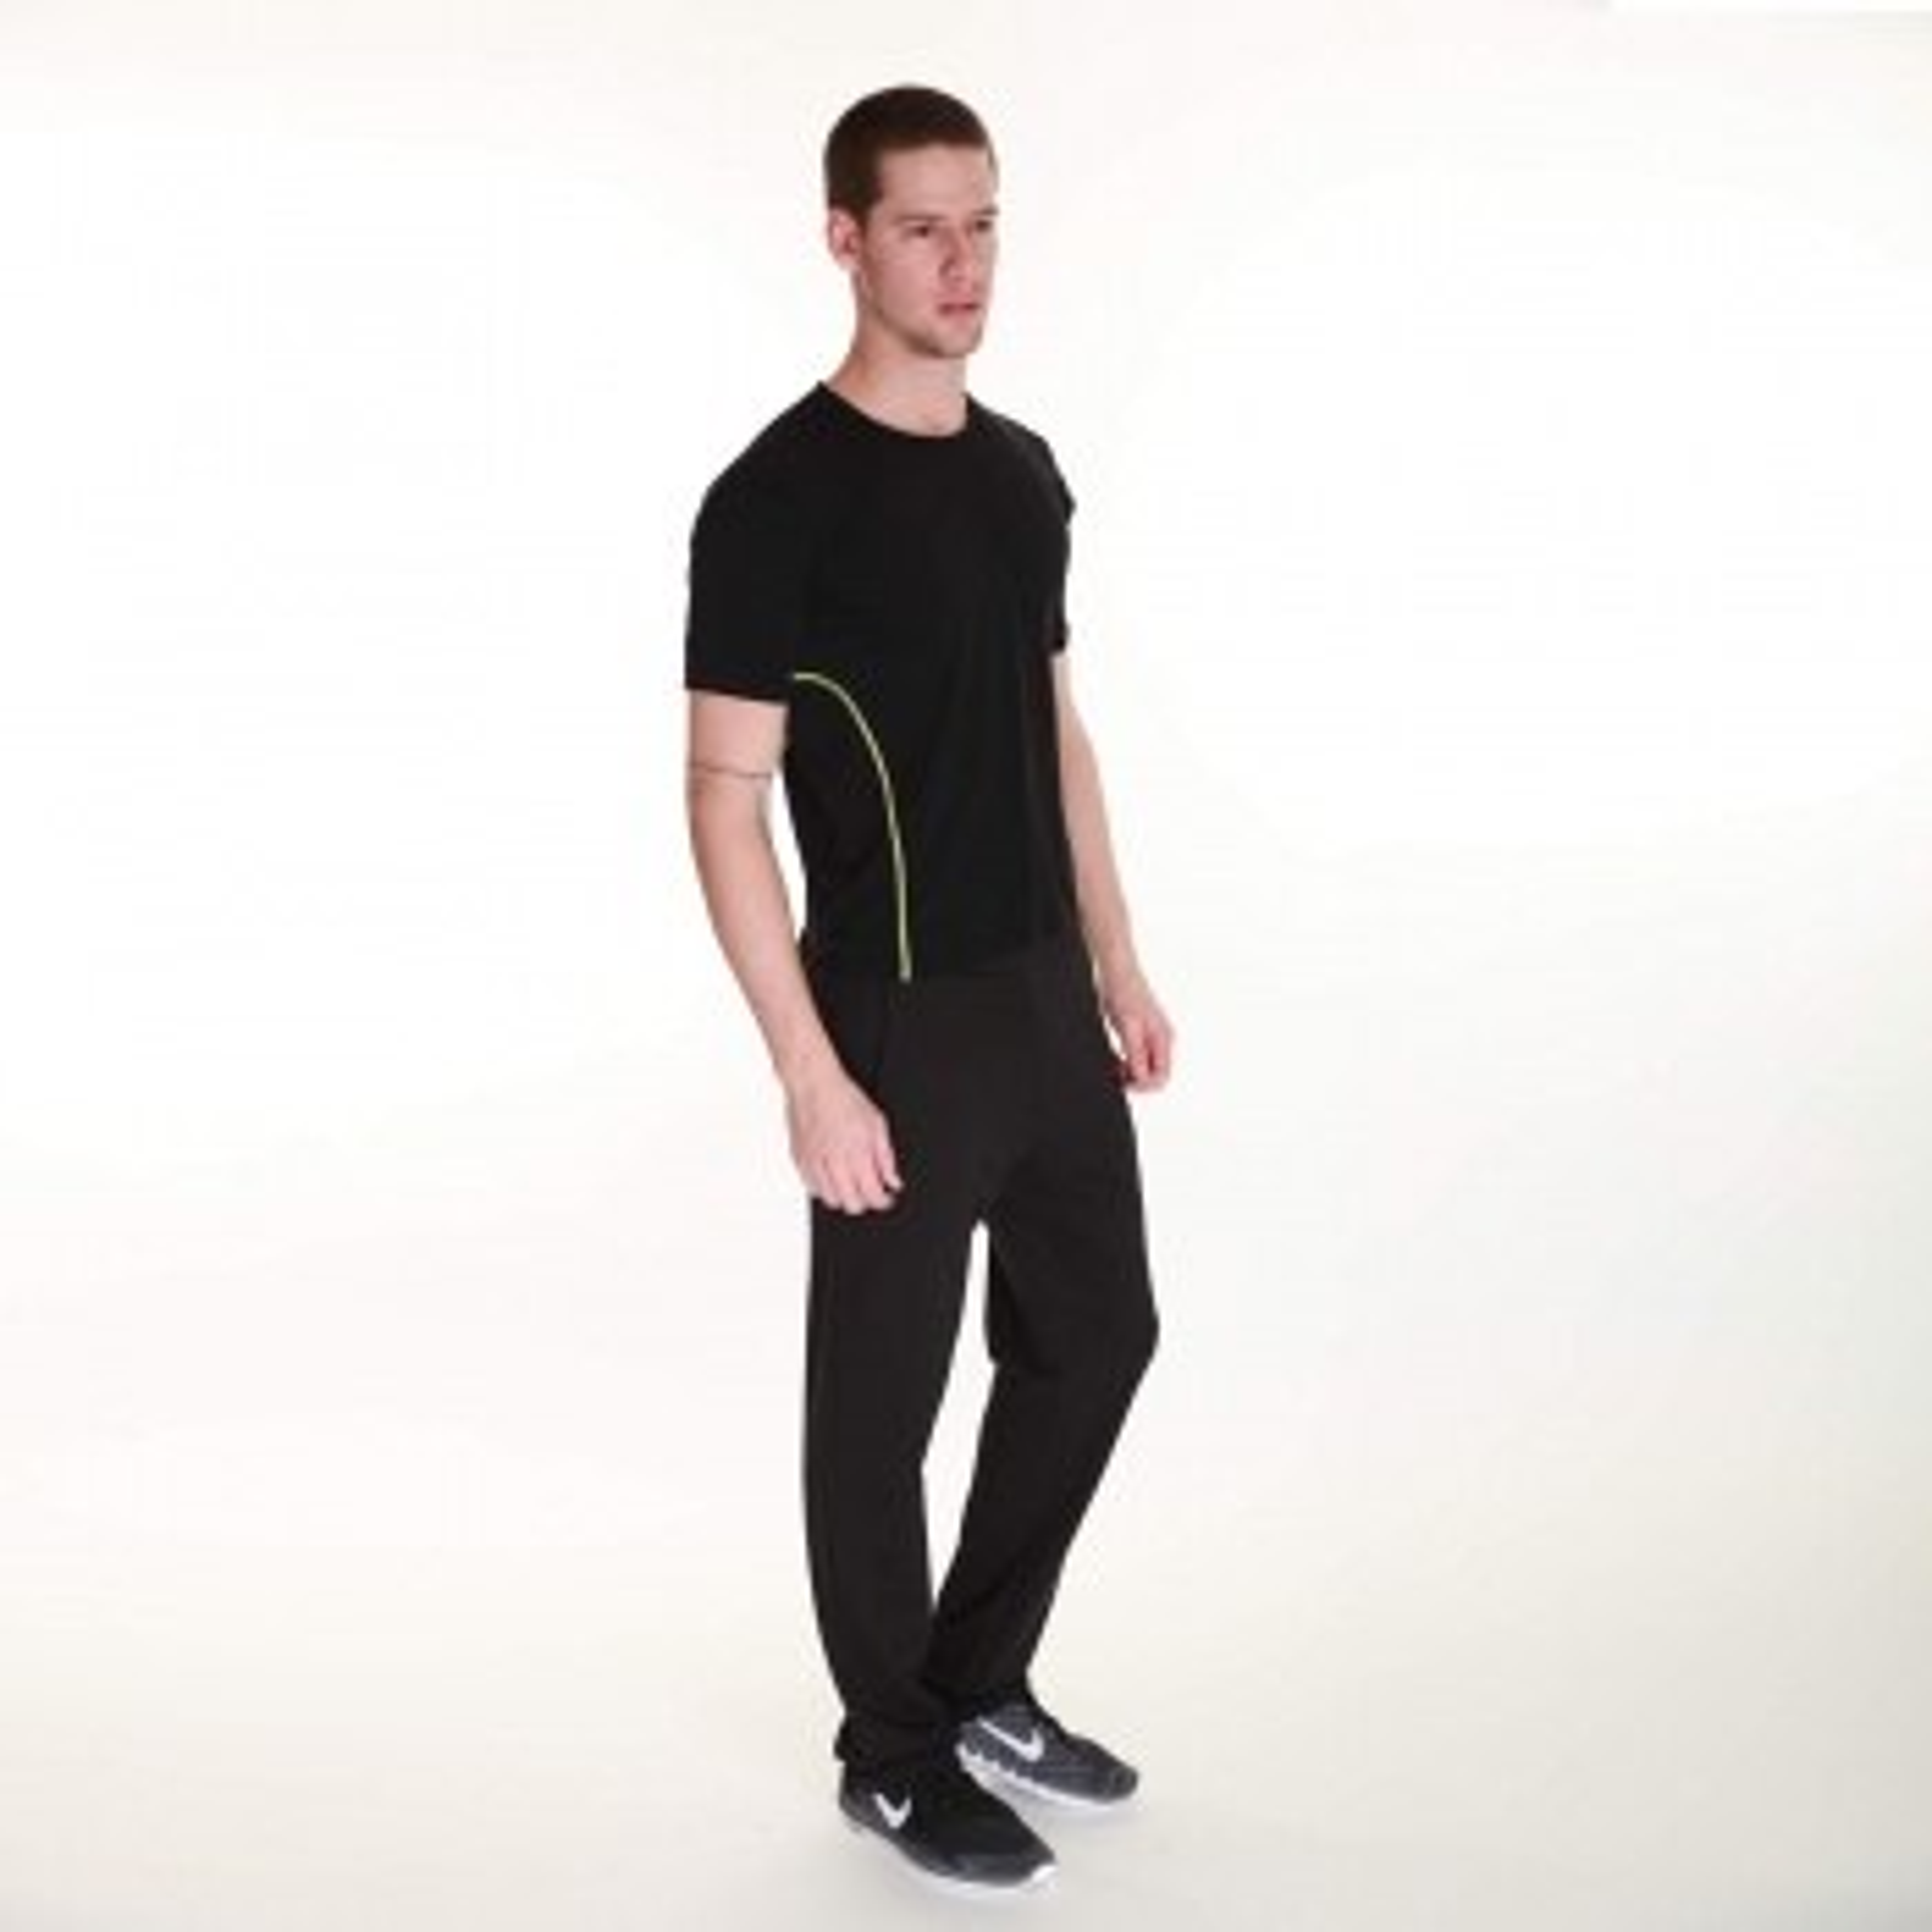 Sportive Erkek Bisiklet Yaka Siyah Tişört